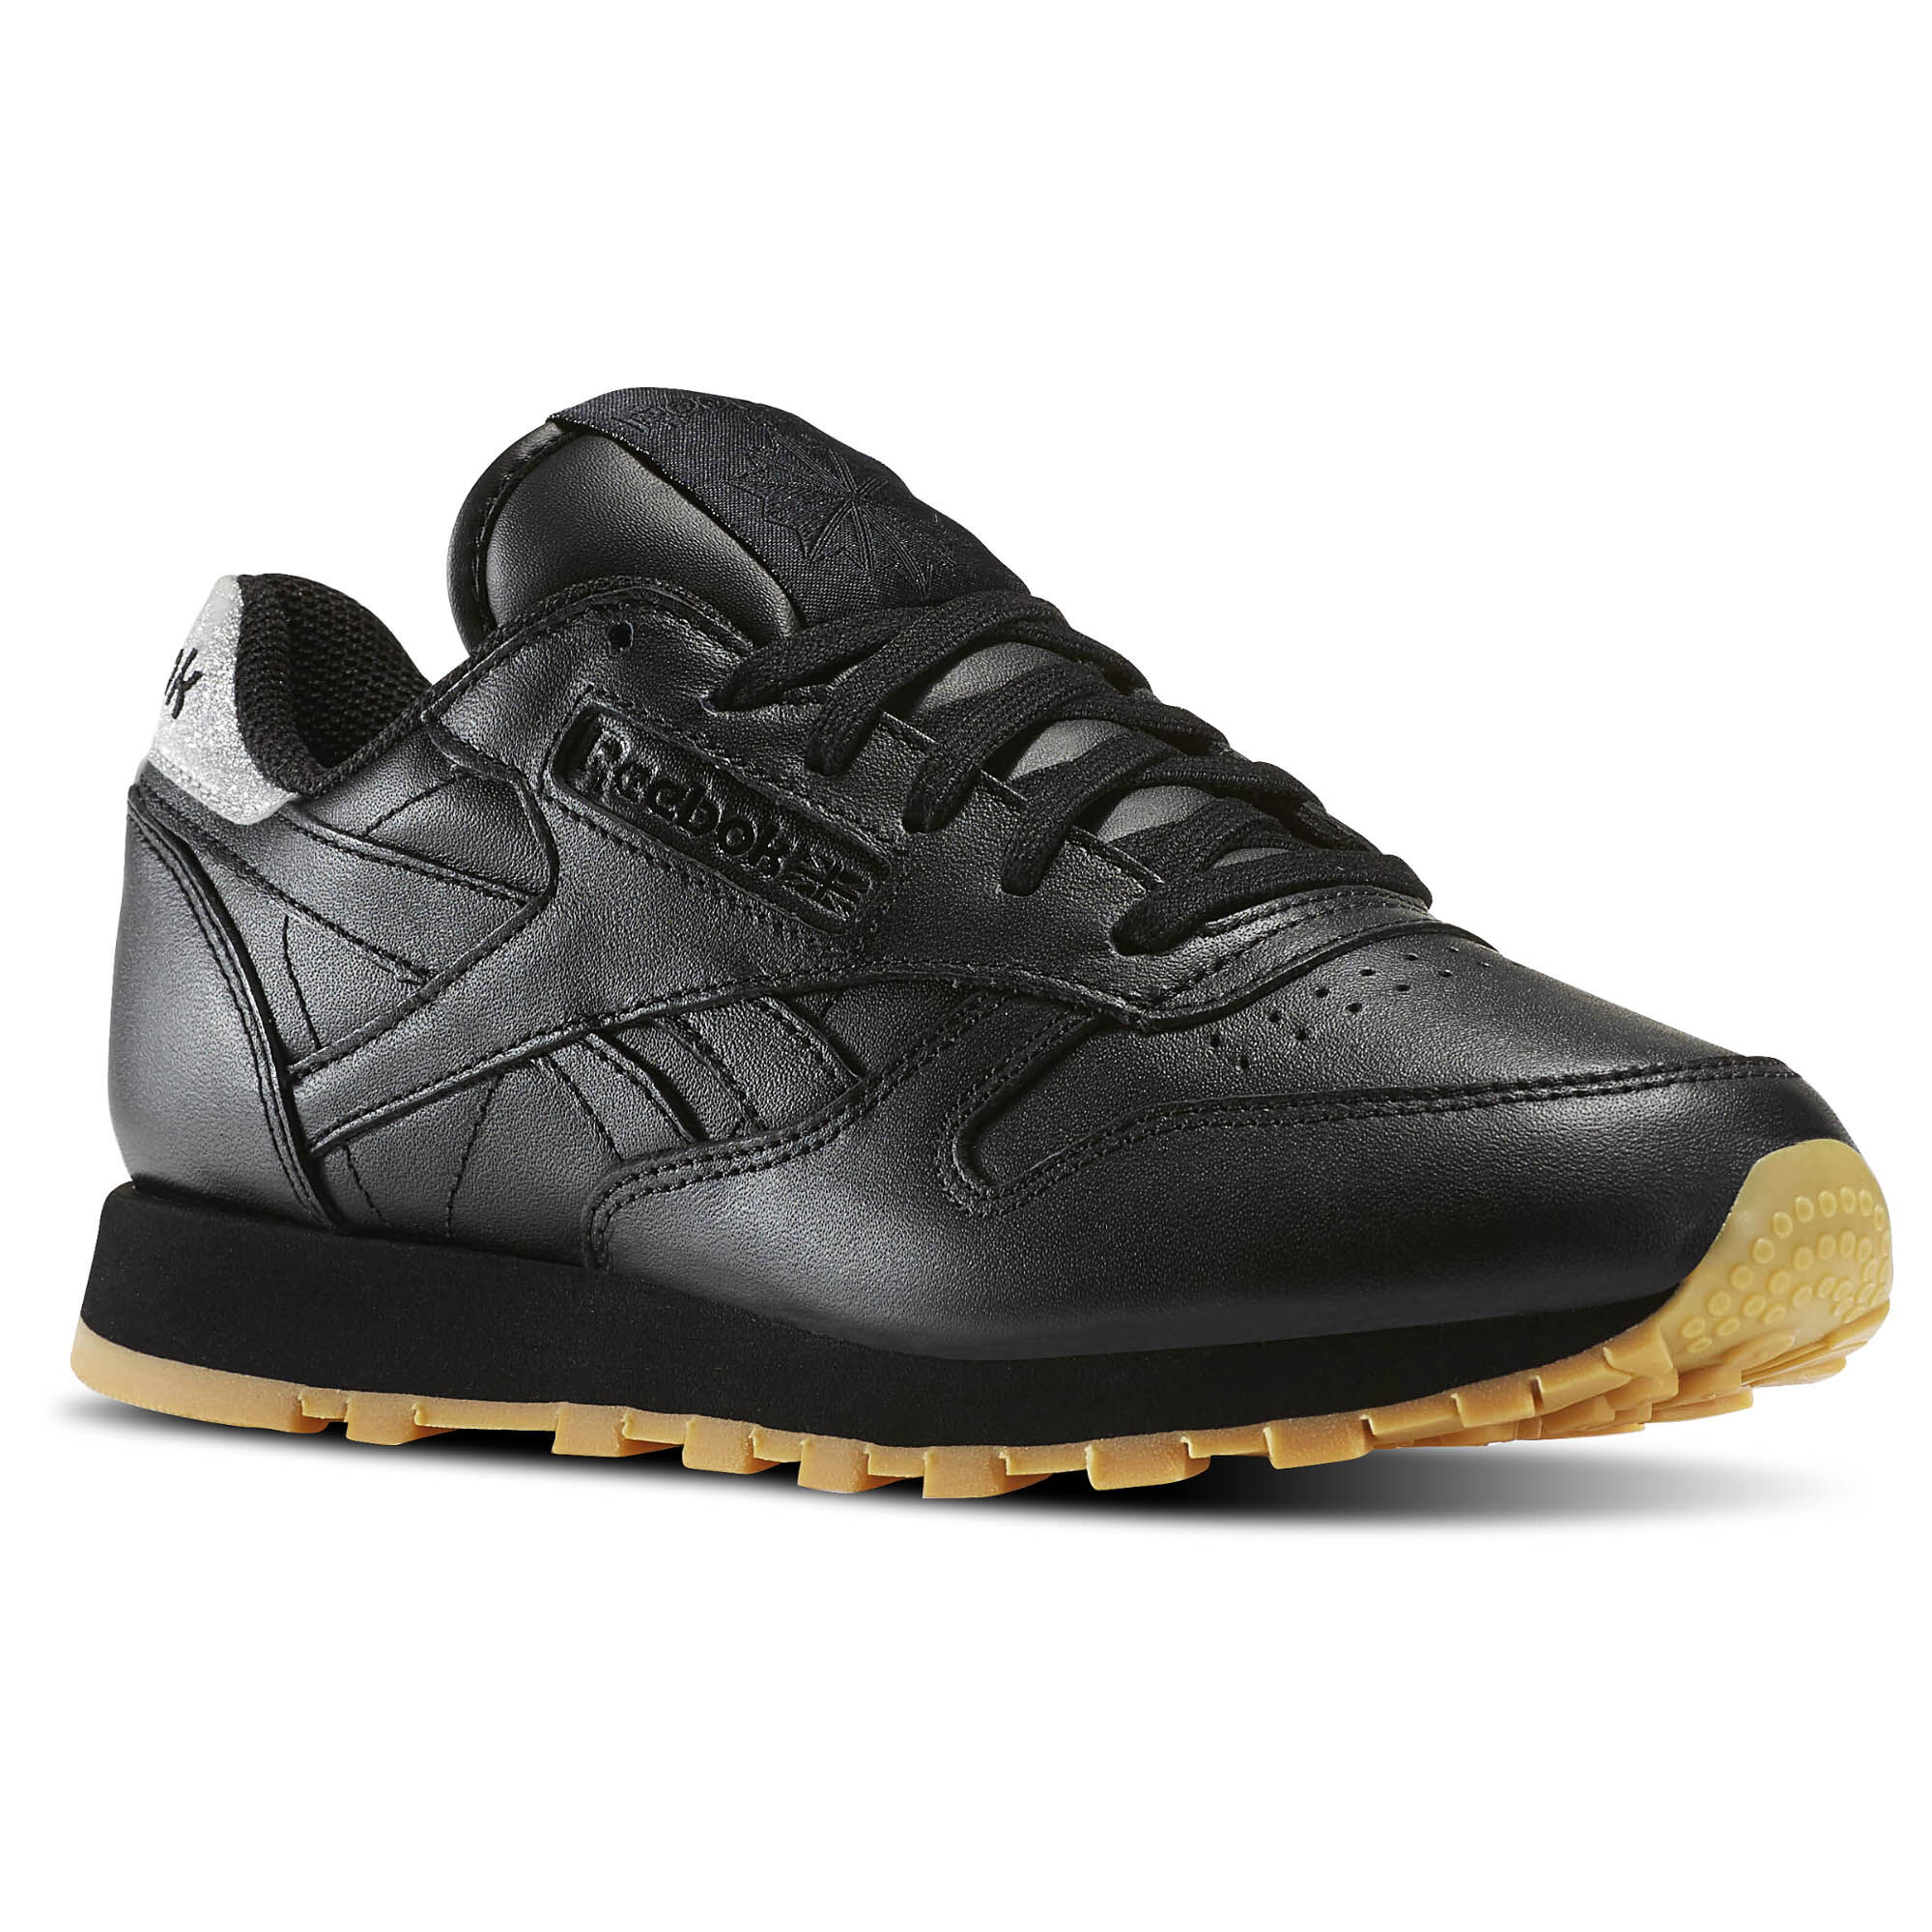 d7ae36c59ef2f reebok classic black gum sole cheap   OFF63% The Largest Catalog ...